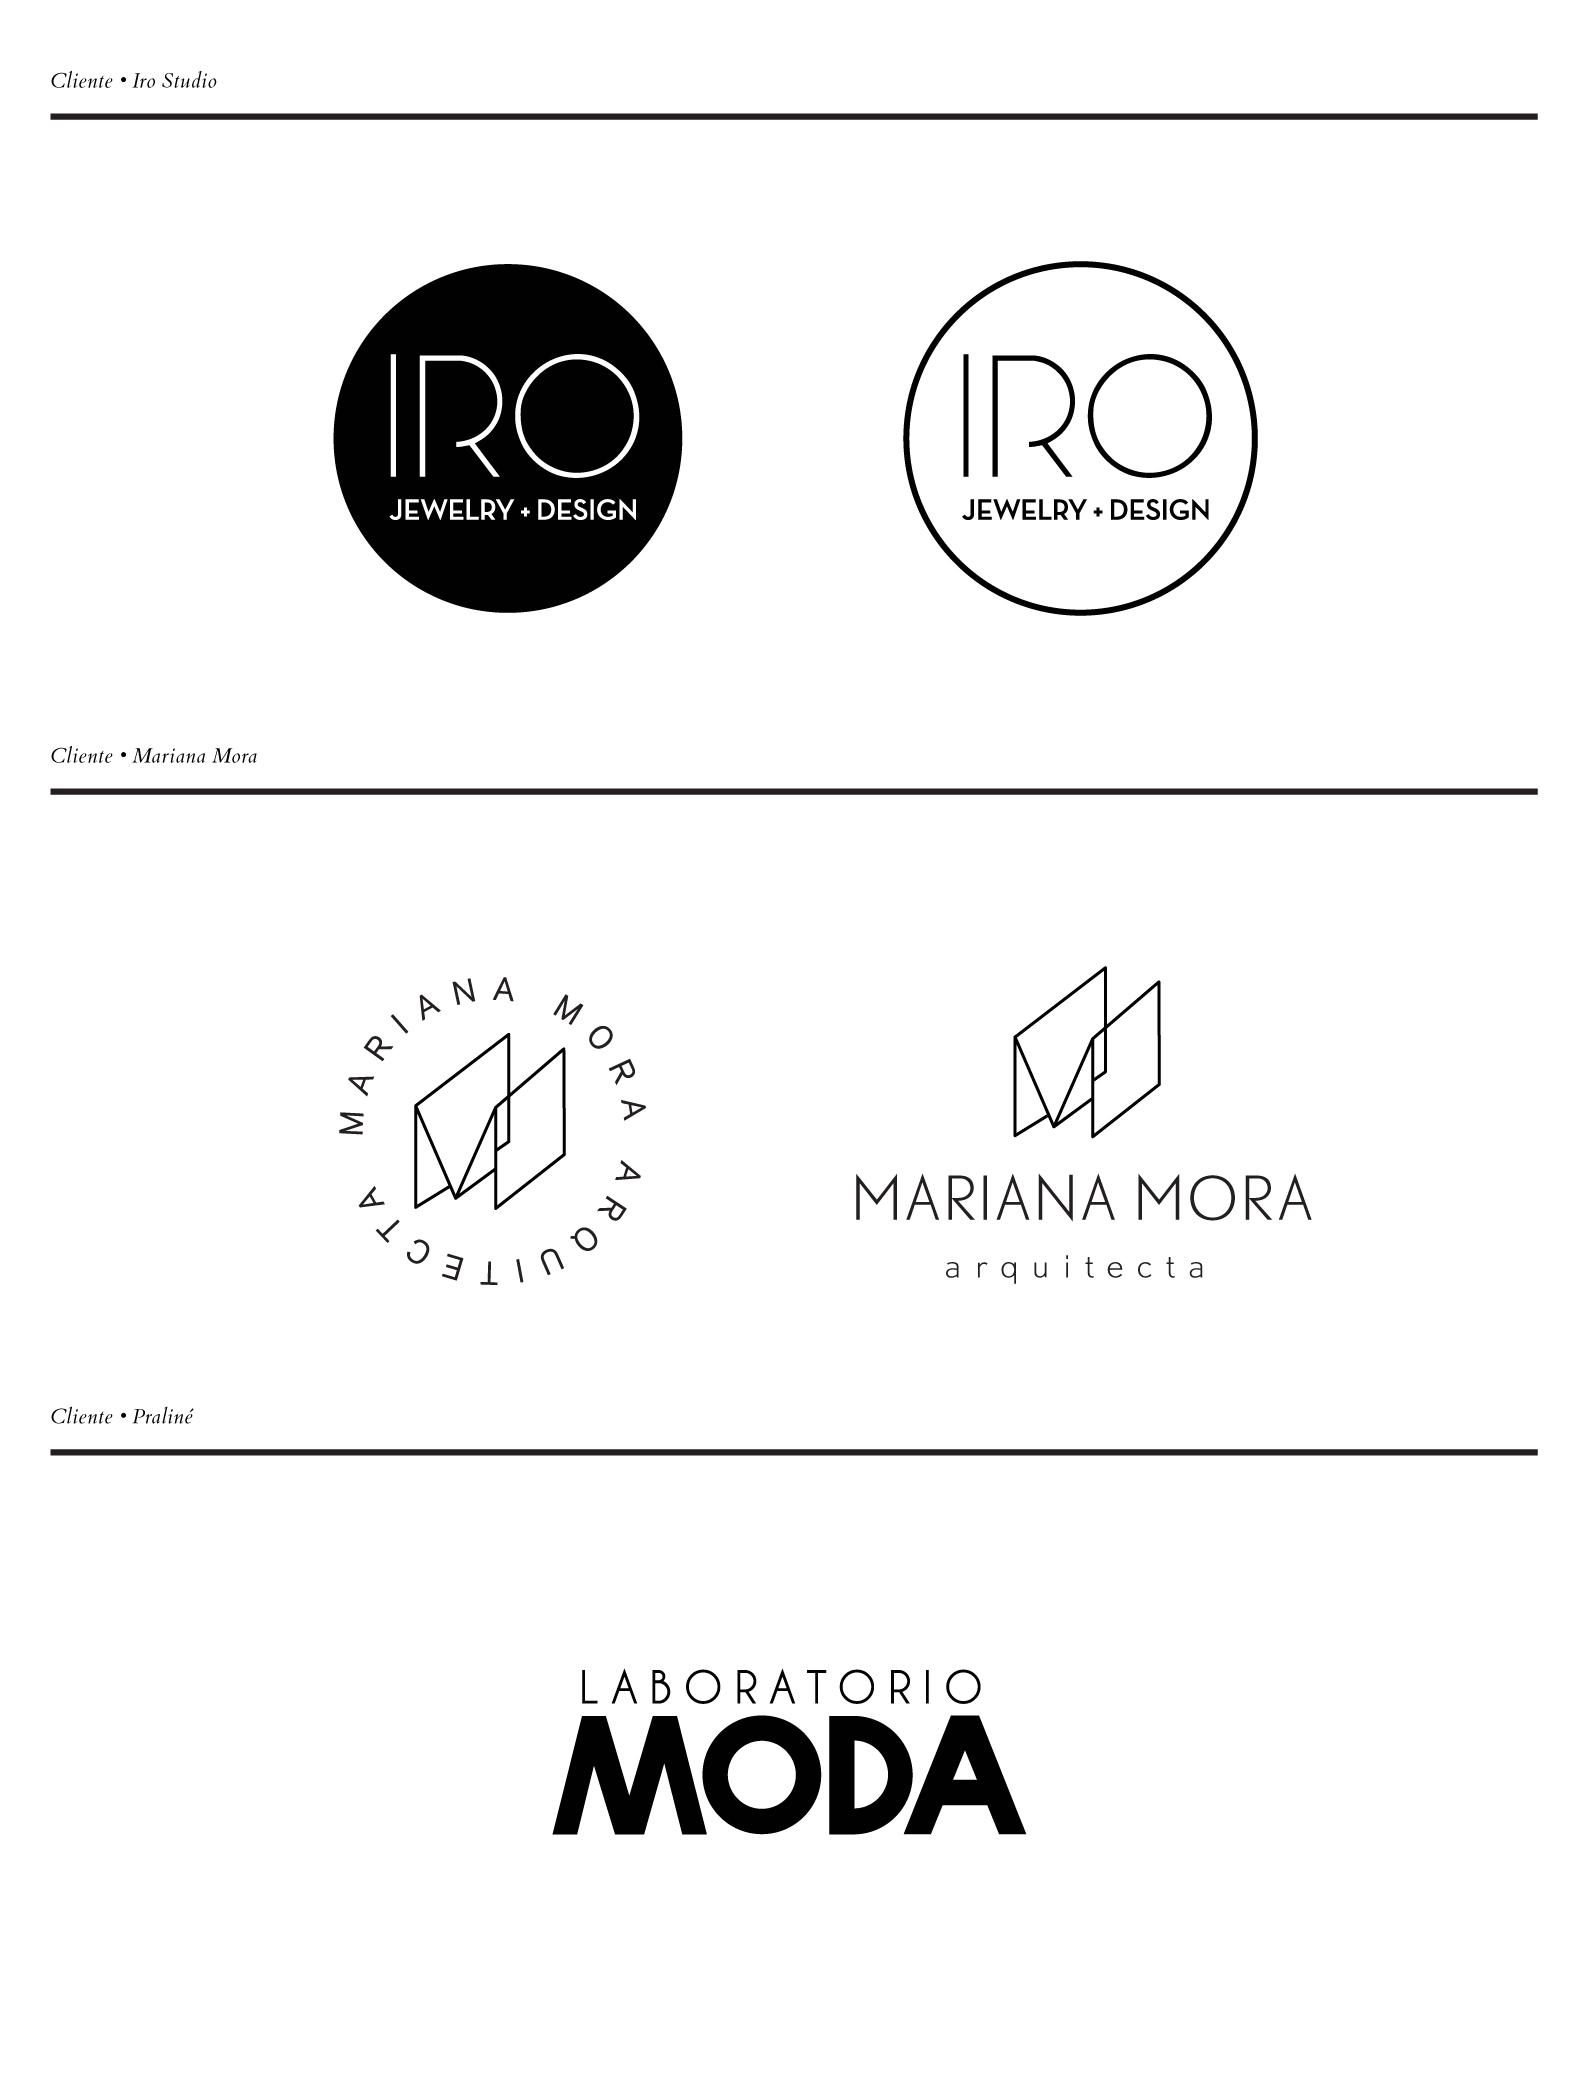 logos-2-v2-02